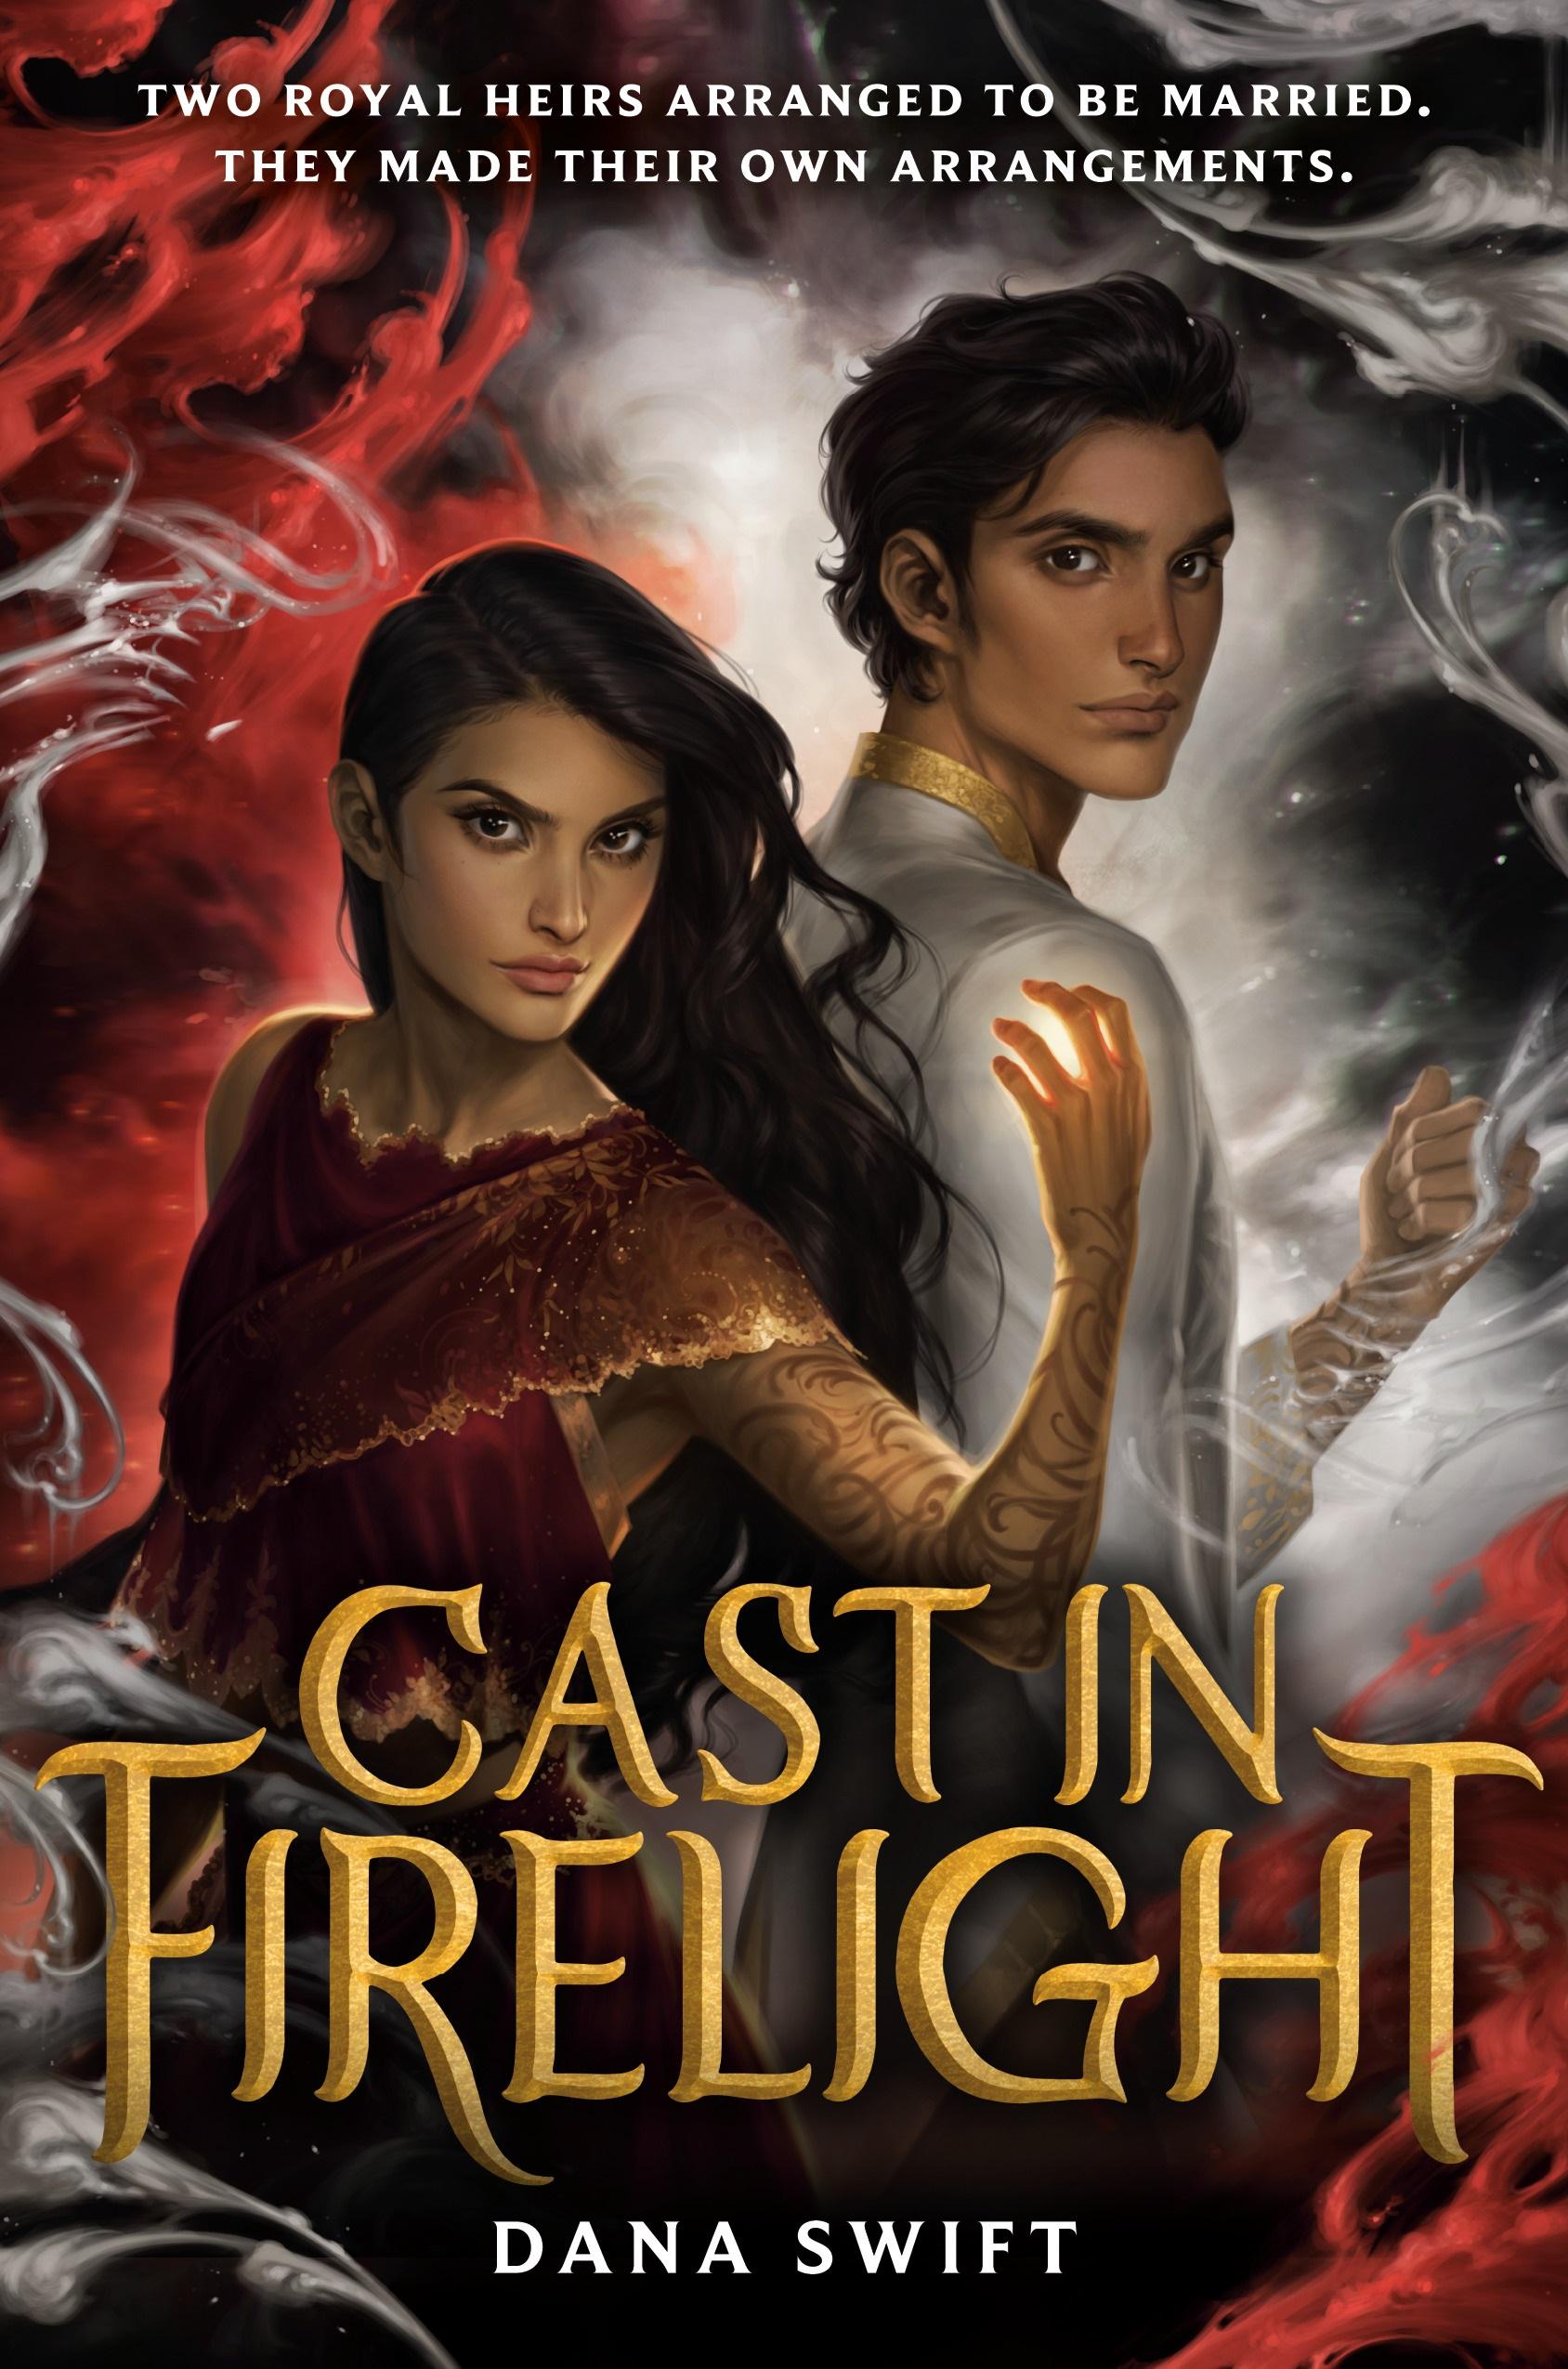 Cast in Firelight book cover